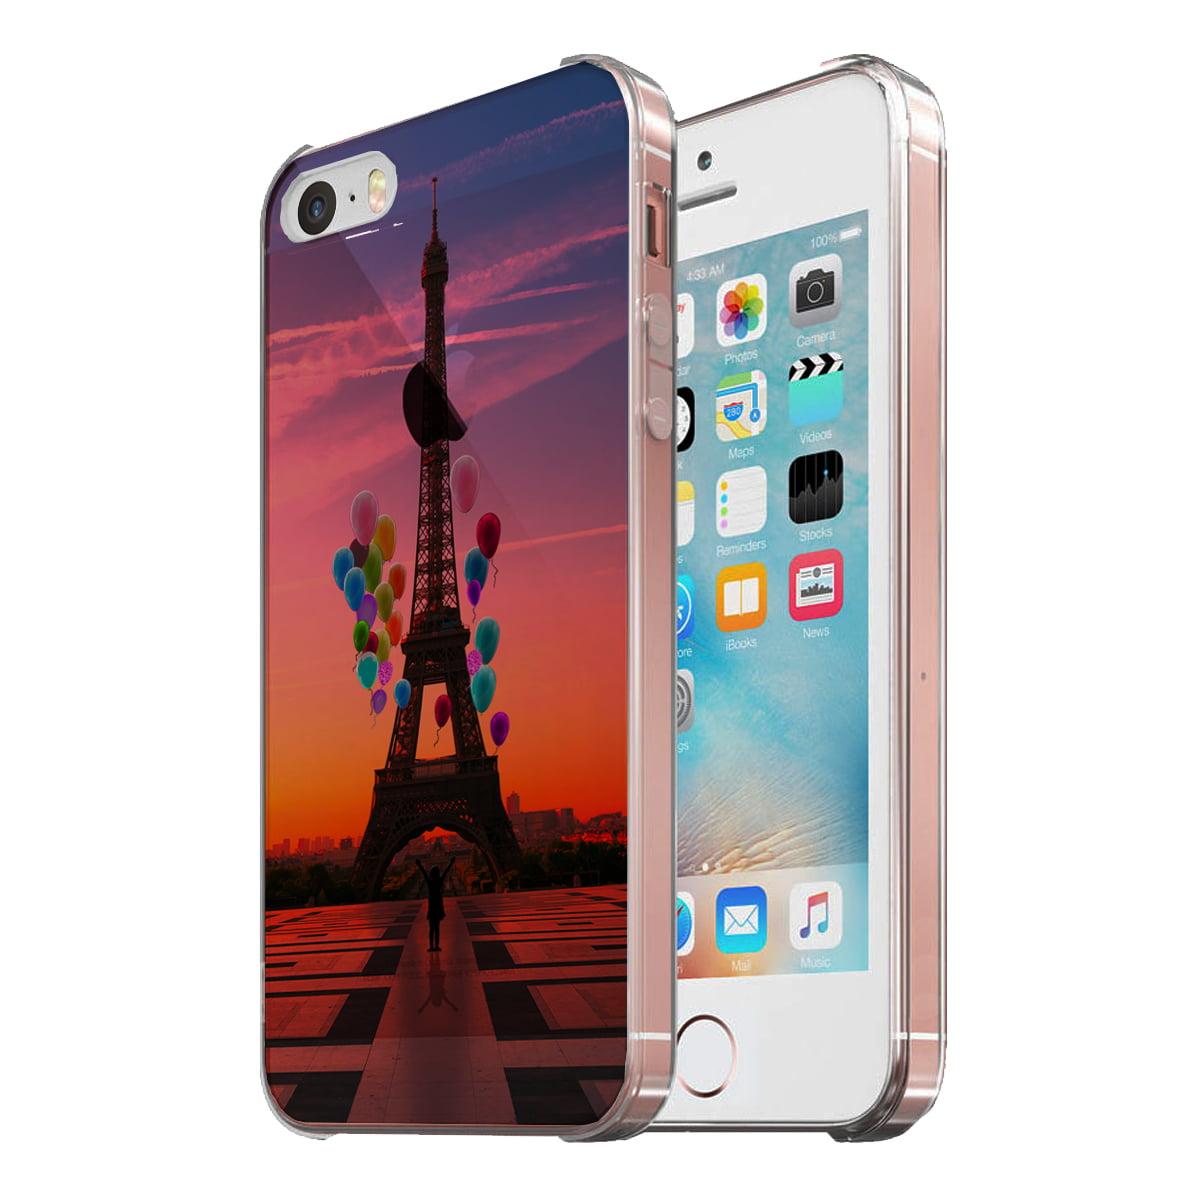 KuzmarK Clear Cover Case fits iPhone SE & iPhone 5 - Paris Eiffel Tower Balloons